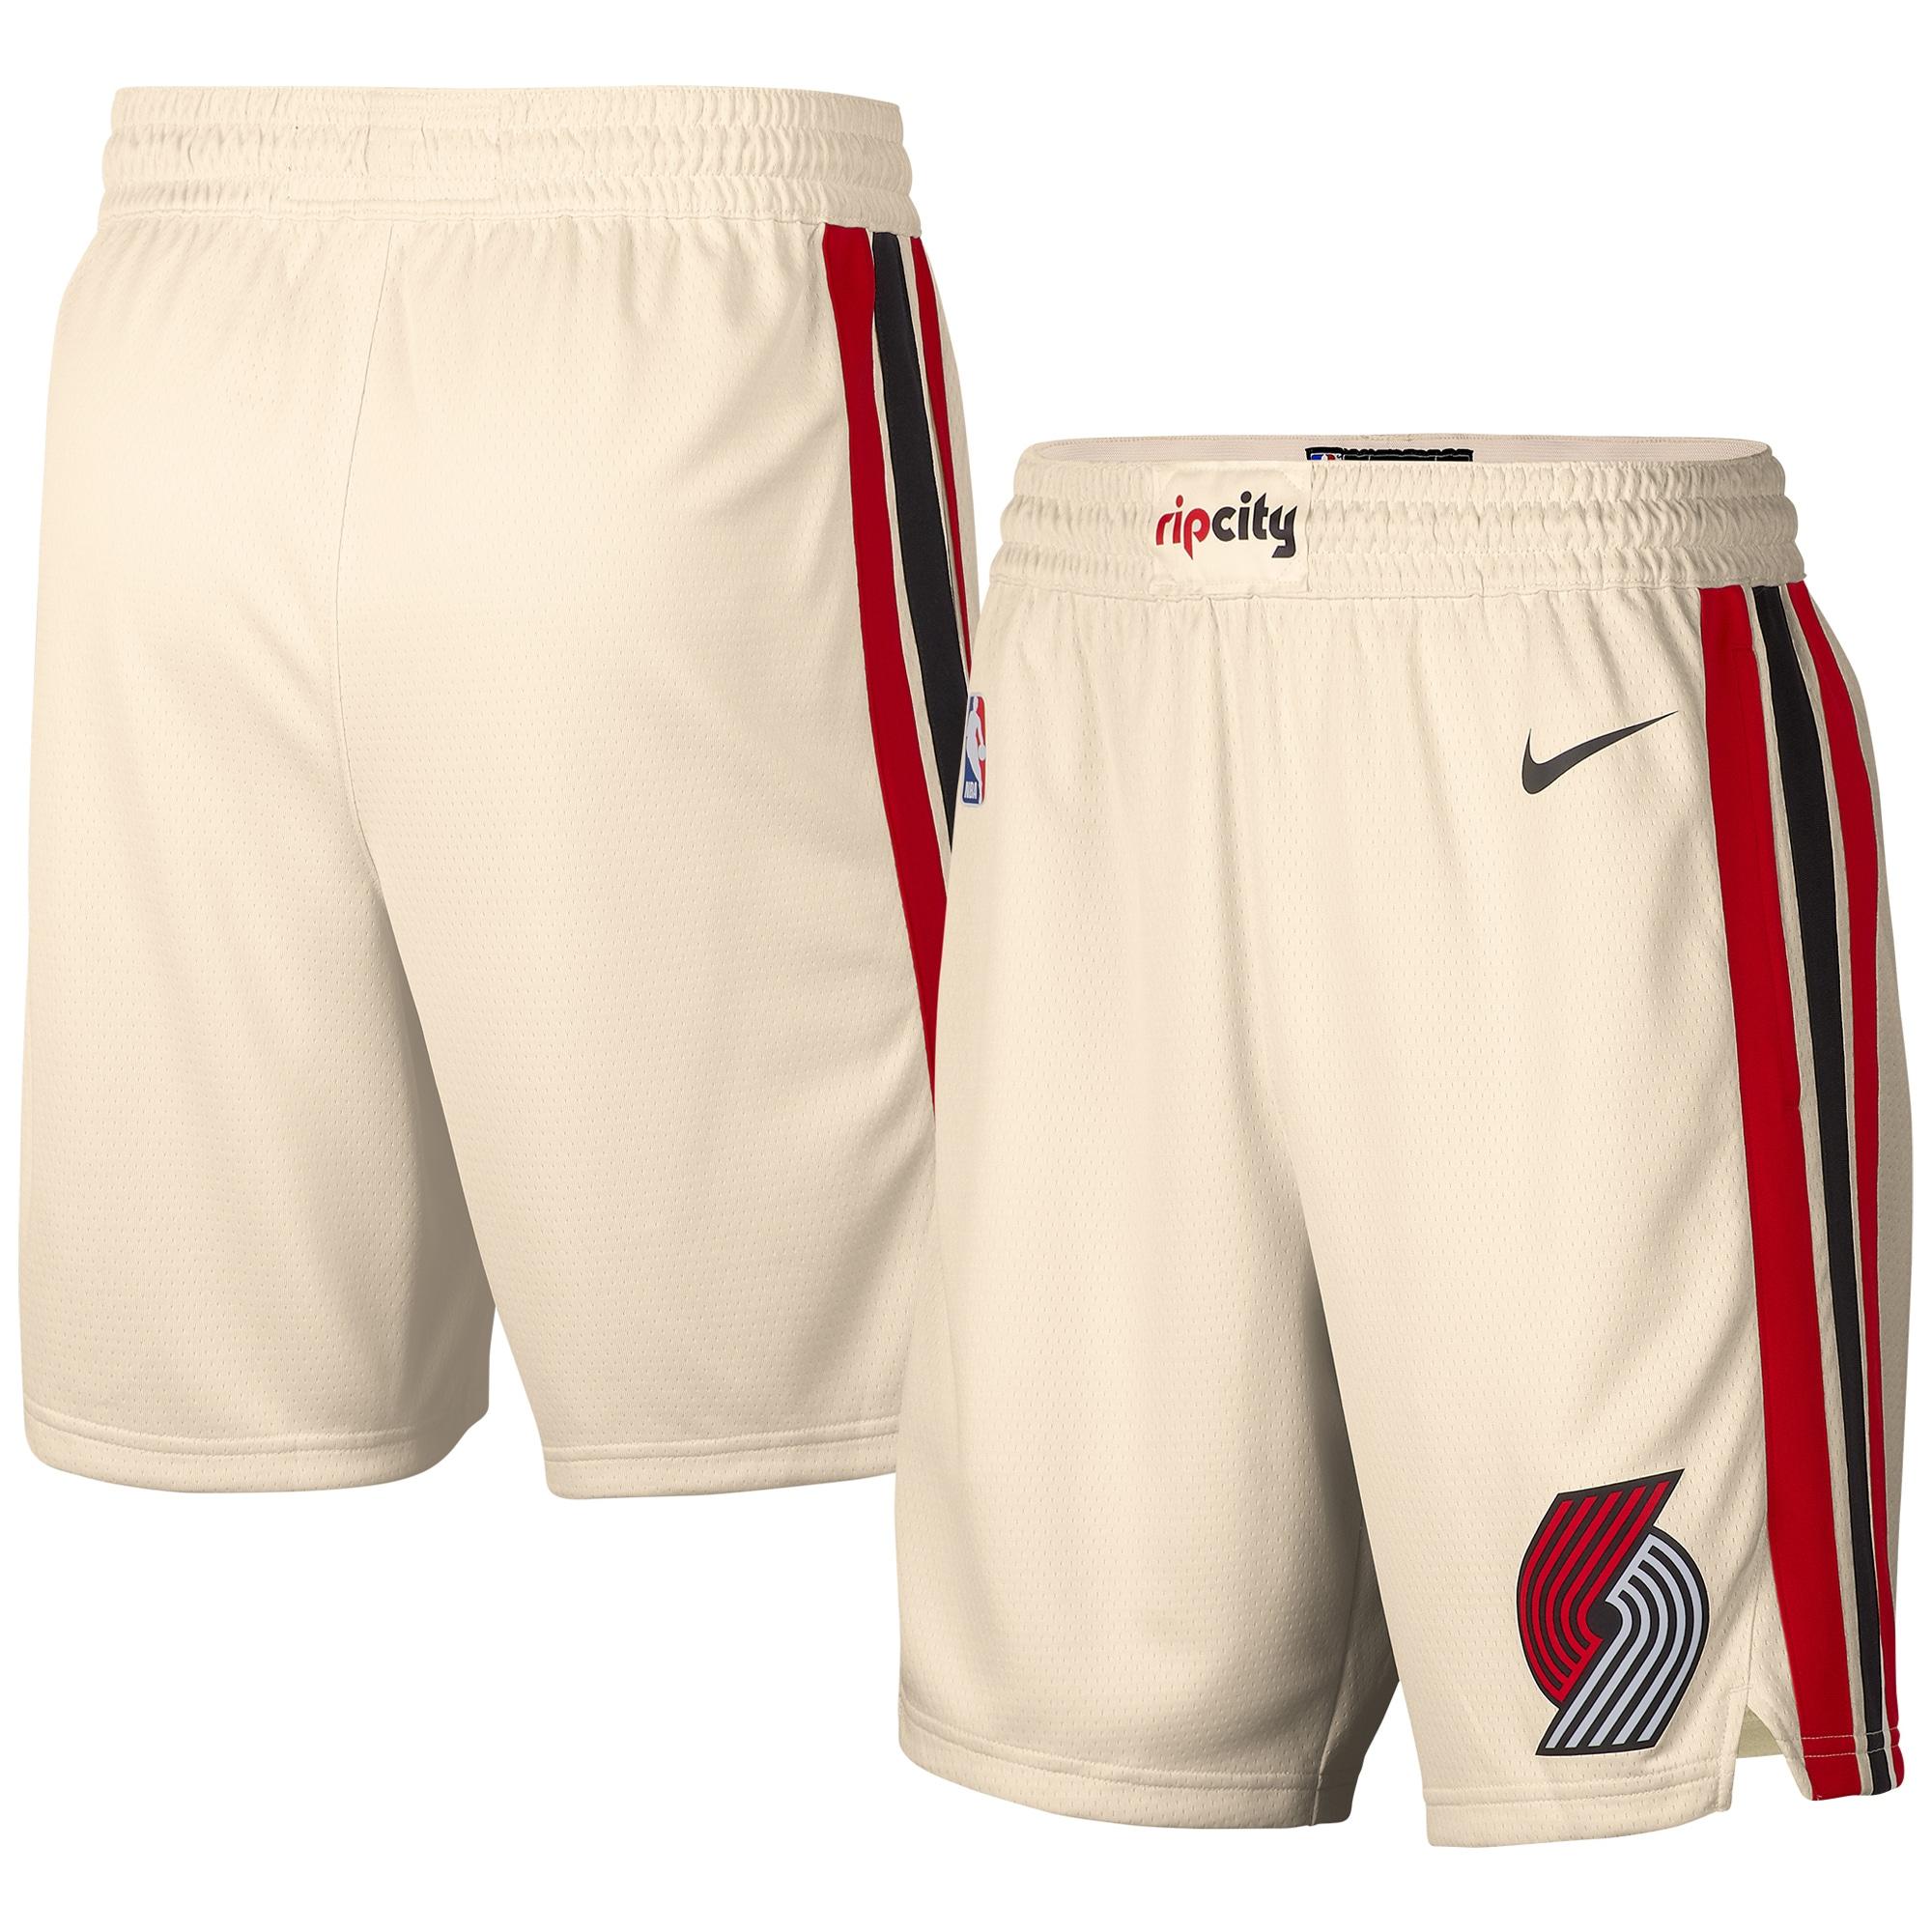 Portland Trail Blazers Nike 2019/20 City Edition Swingman Shorts - Cream